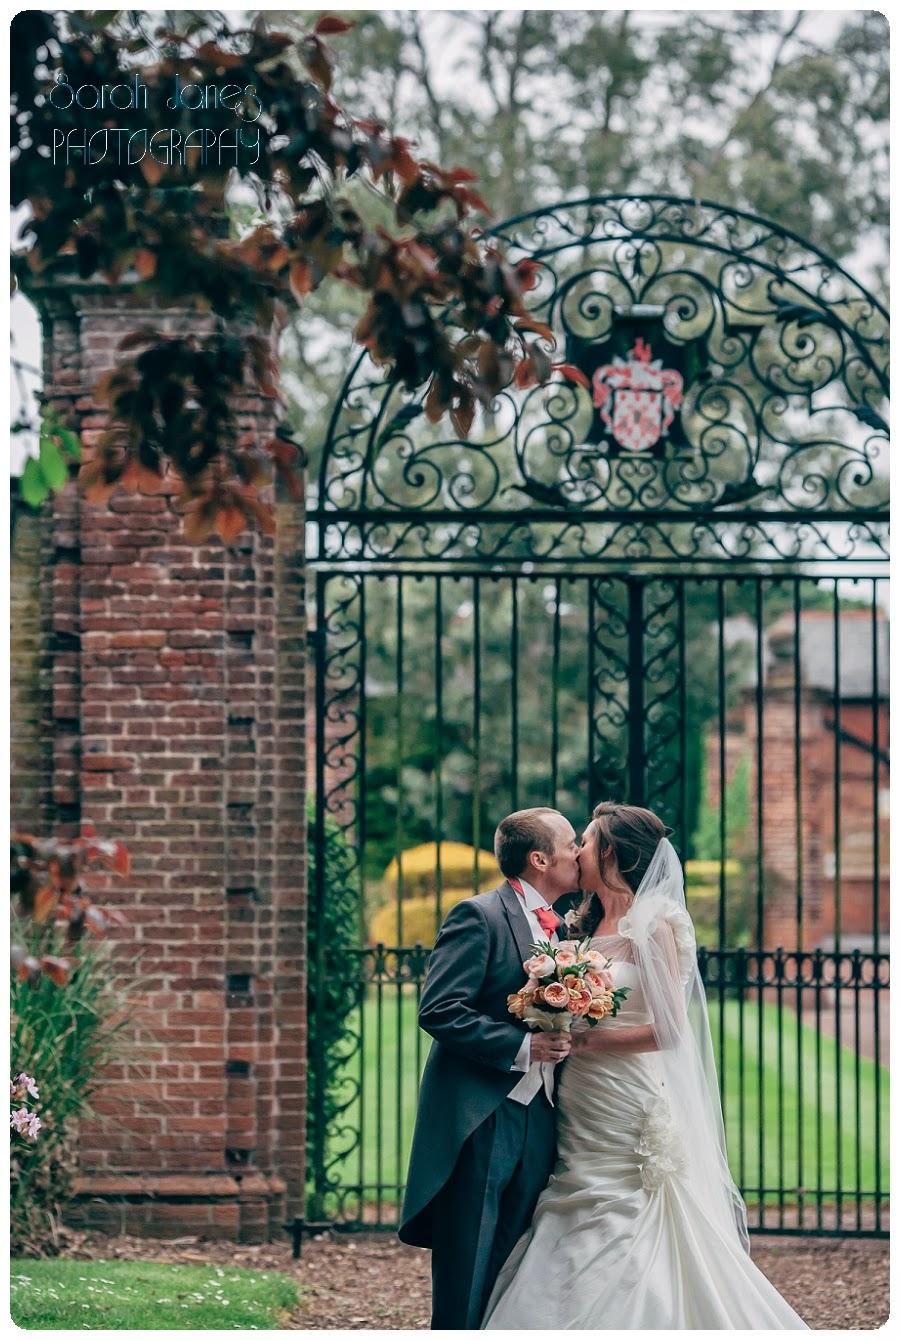 Wedding%2BPhotography%2BIngelwood%2BManor%2C%2BWedding%2Bphotography%2BWirral_0046.jpg